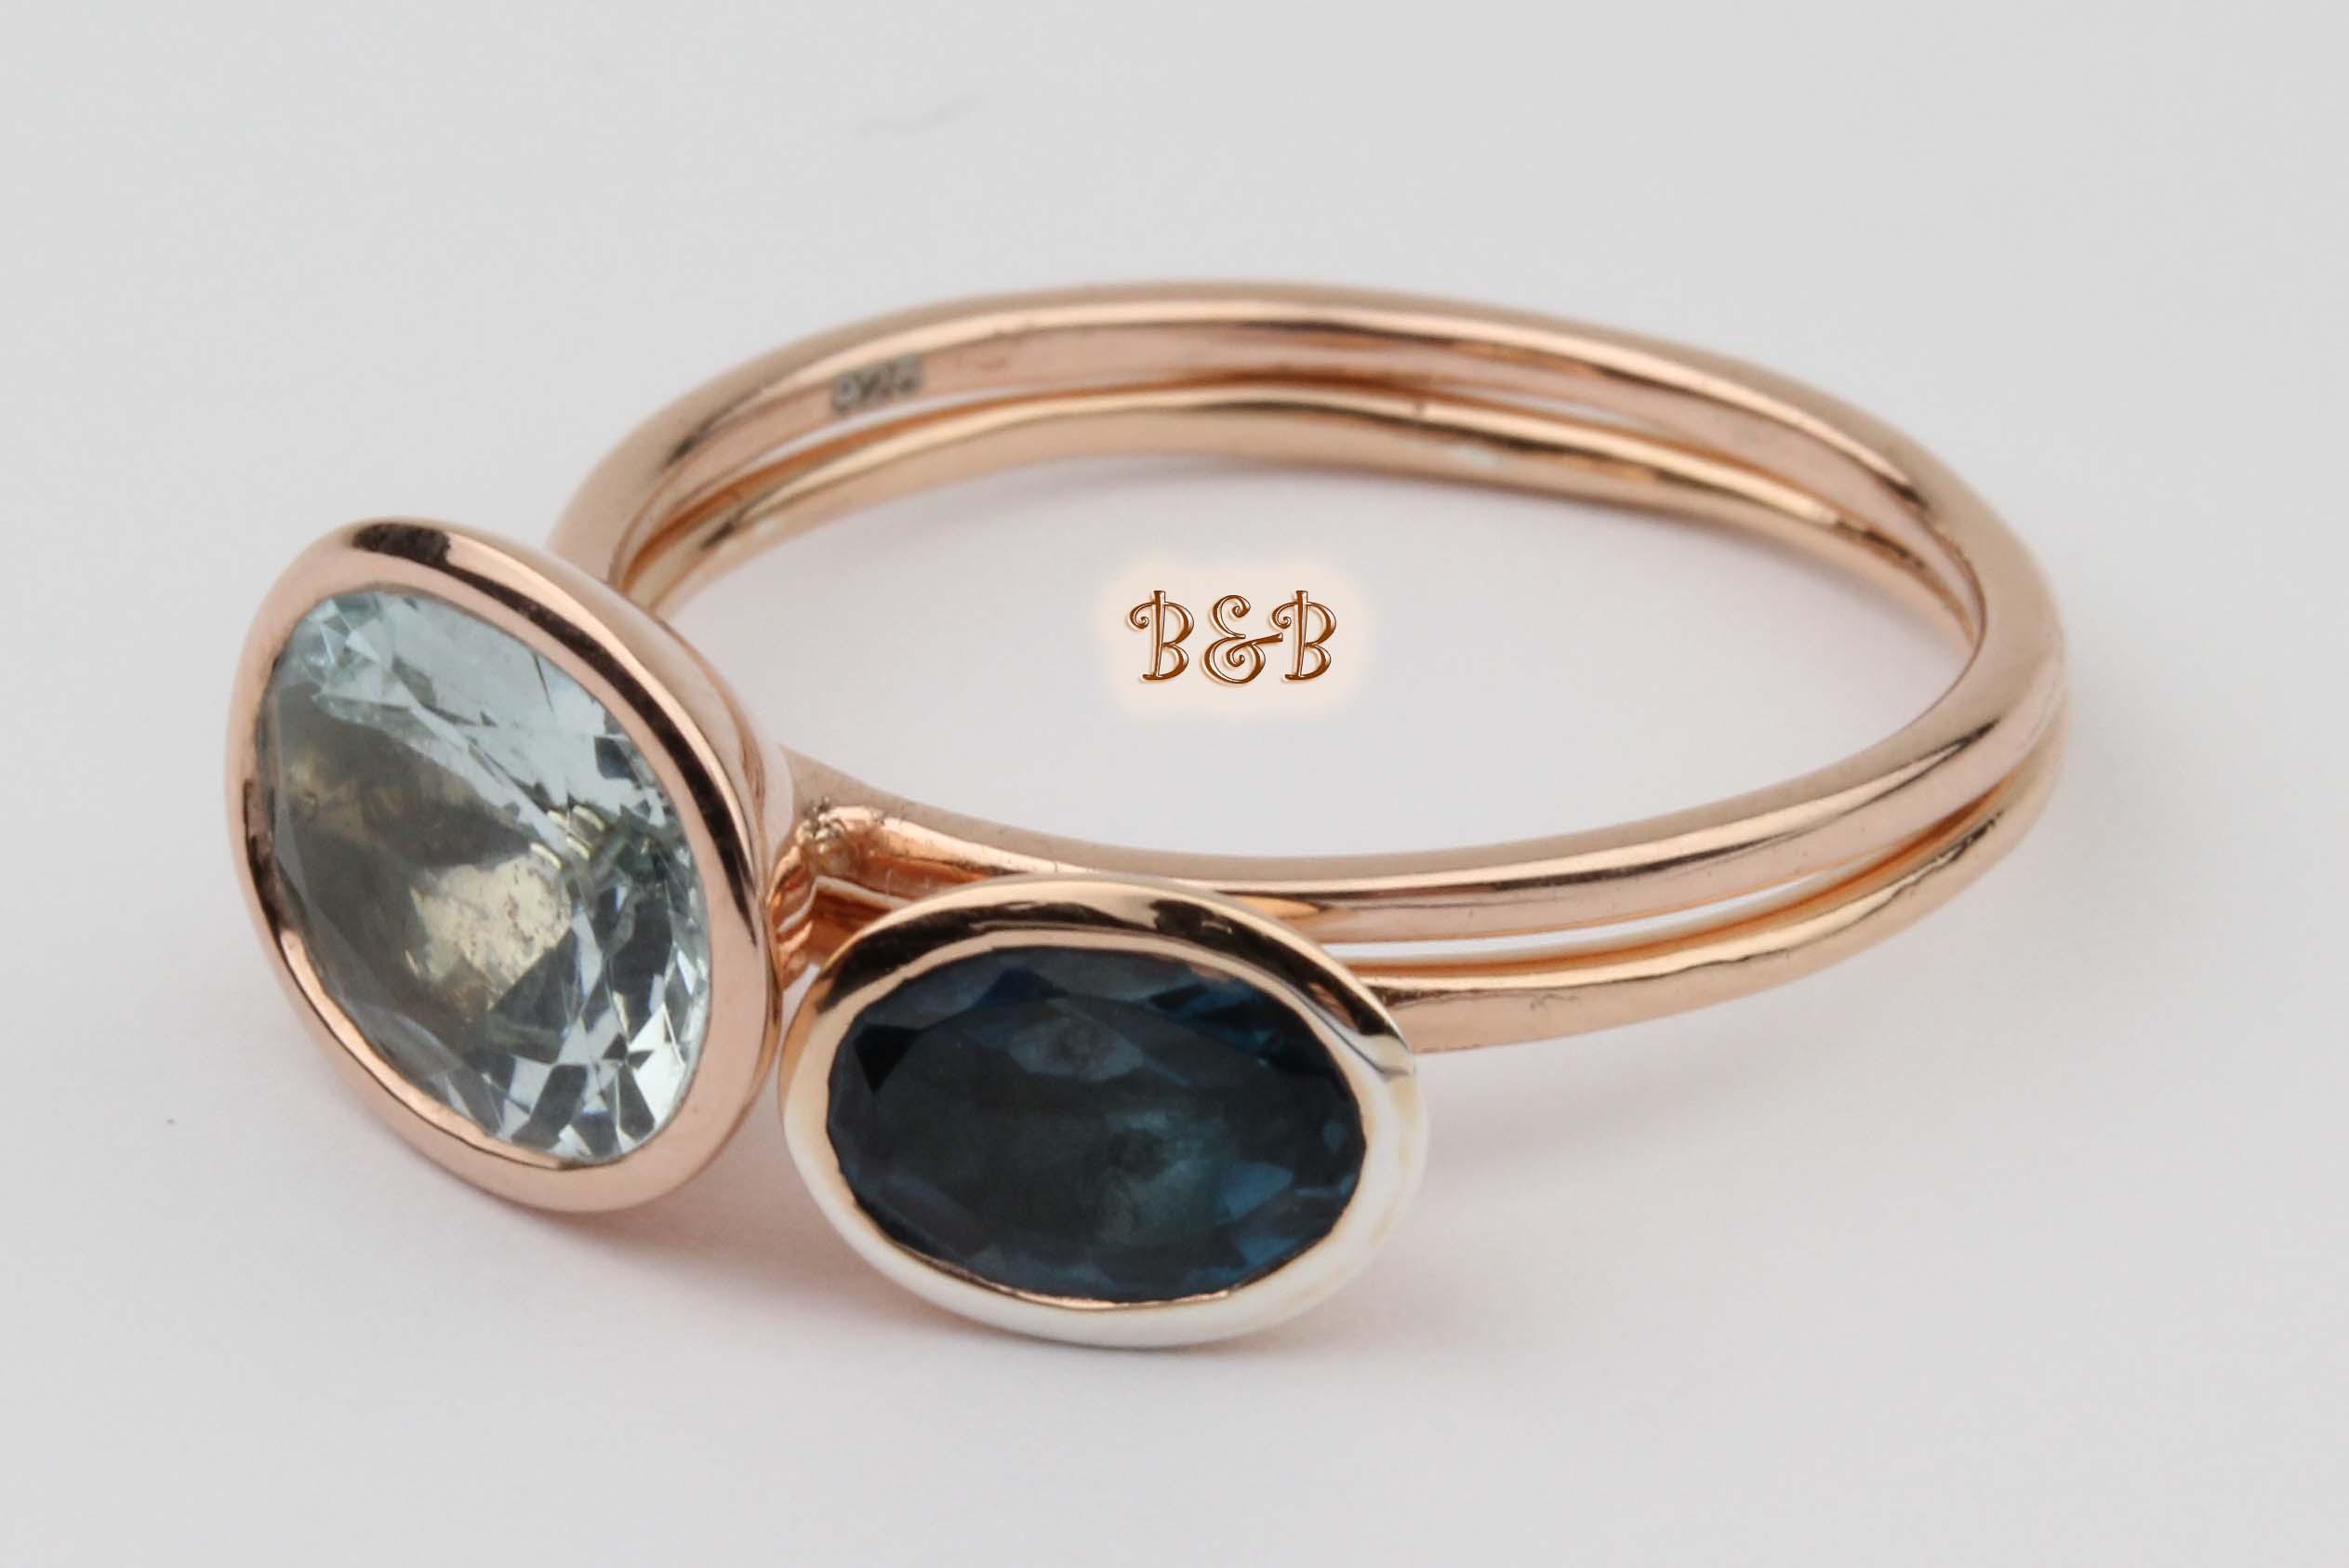 Silver ring_B&B_1845